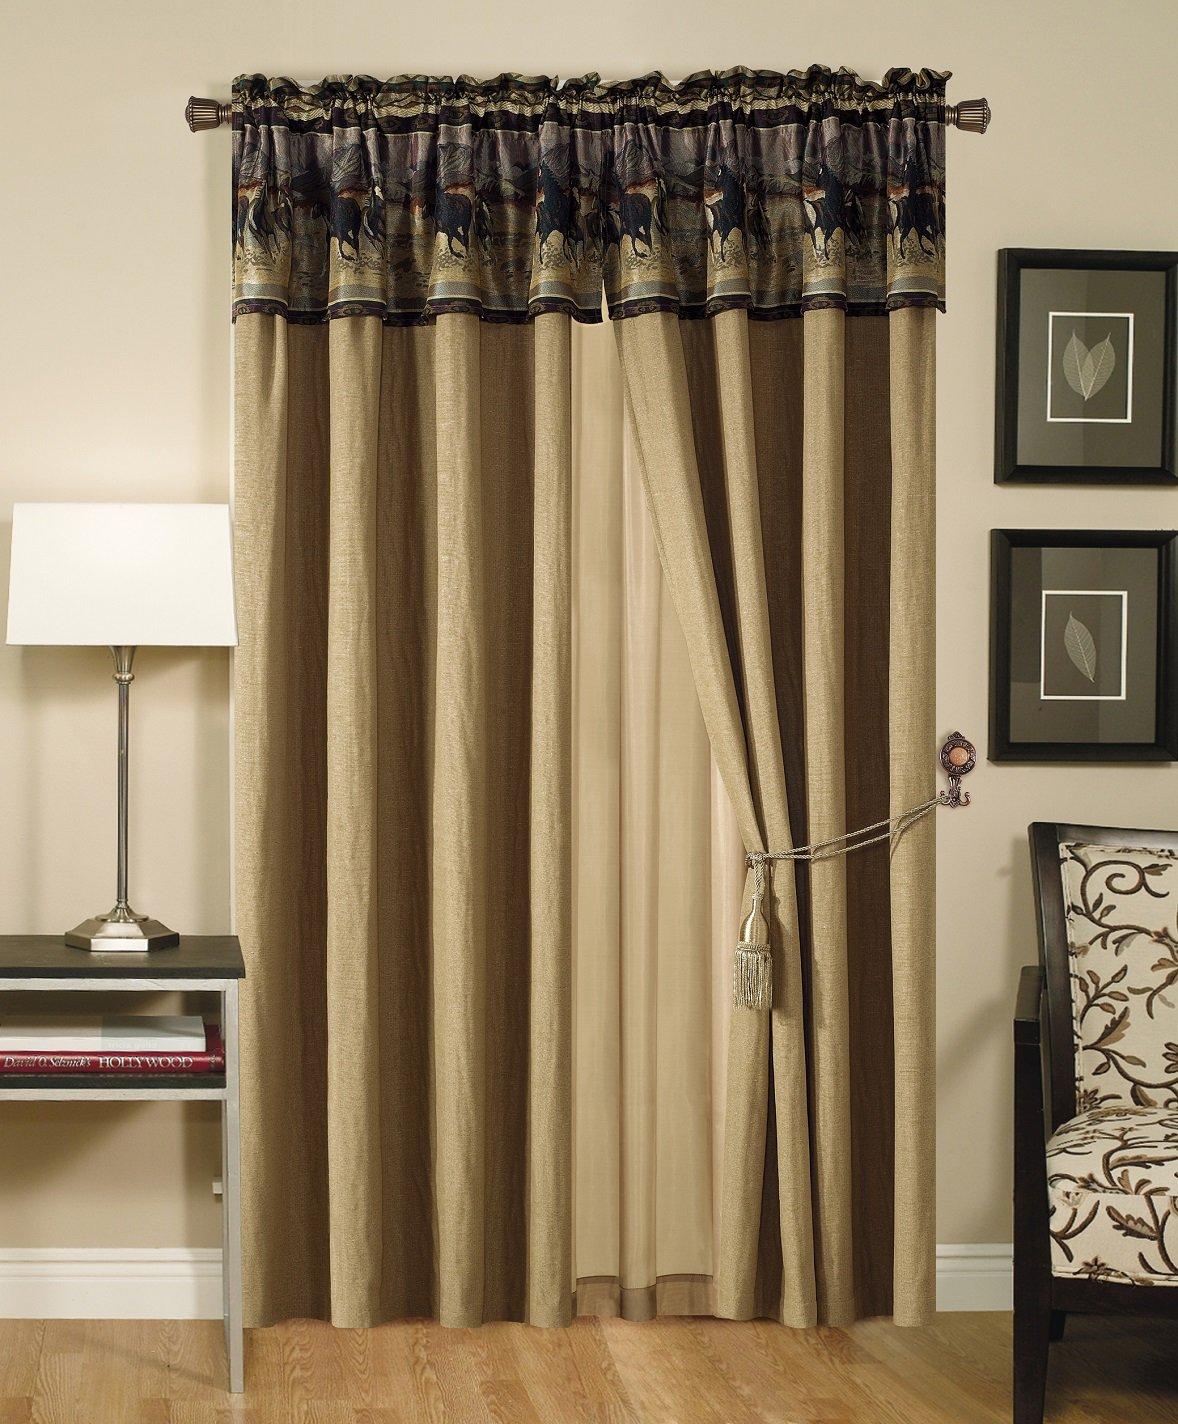 Horse window curtains